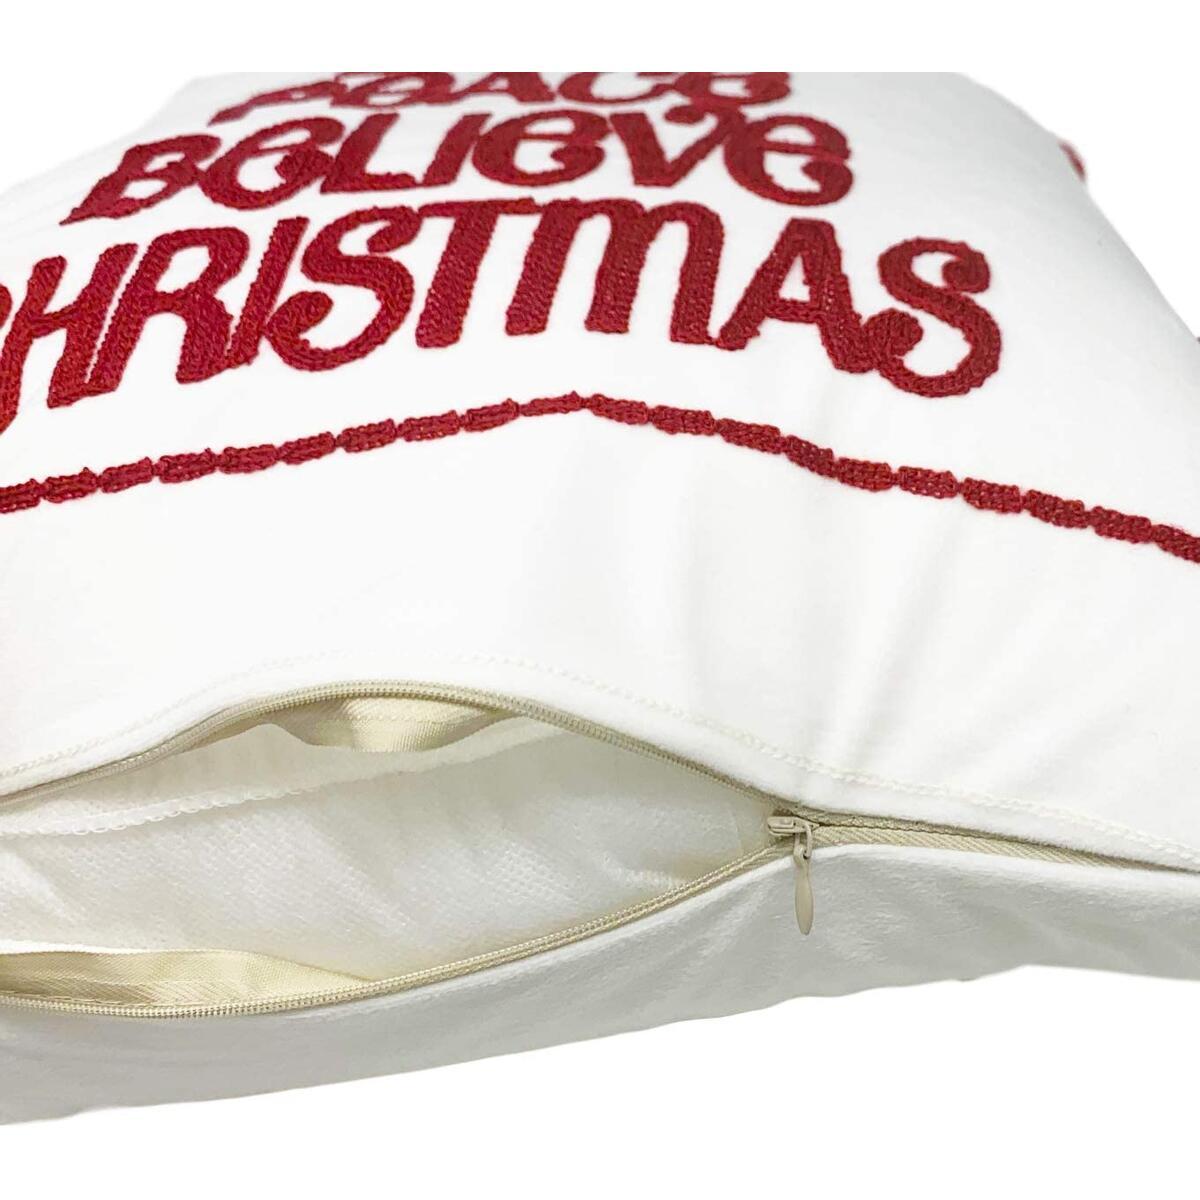 Joy Christmas Decor, Velvet Christmas Throw Pillow Covers Set of 2 Christmas Pillows, Joy Peace Believe Christmas Pillows